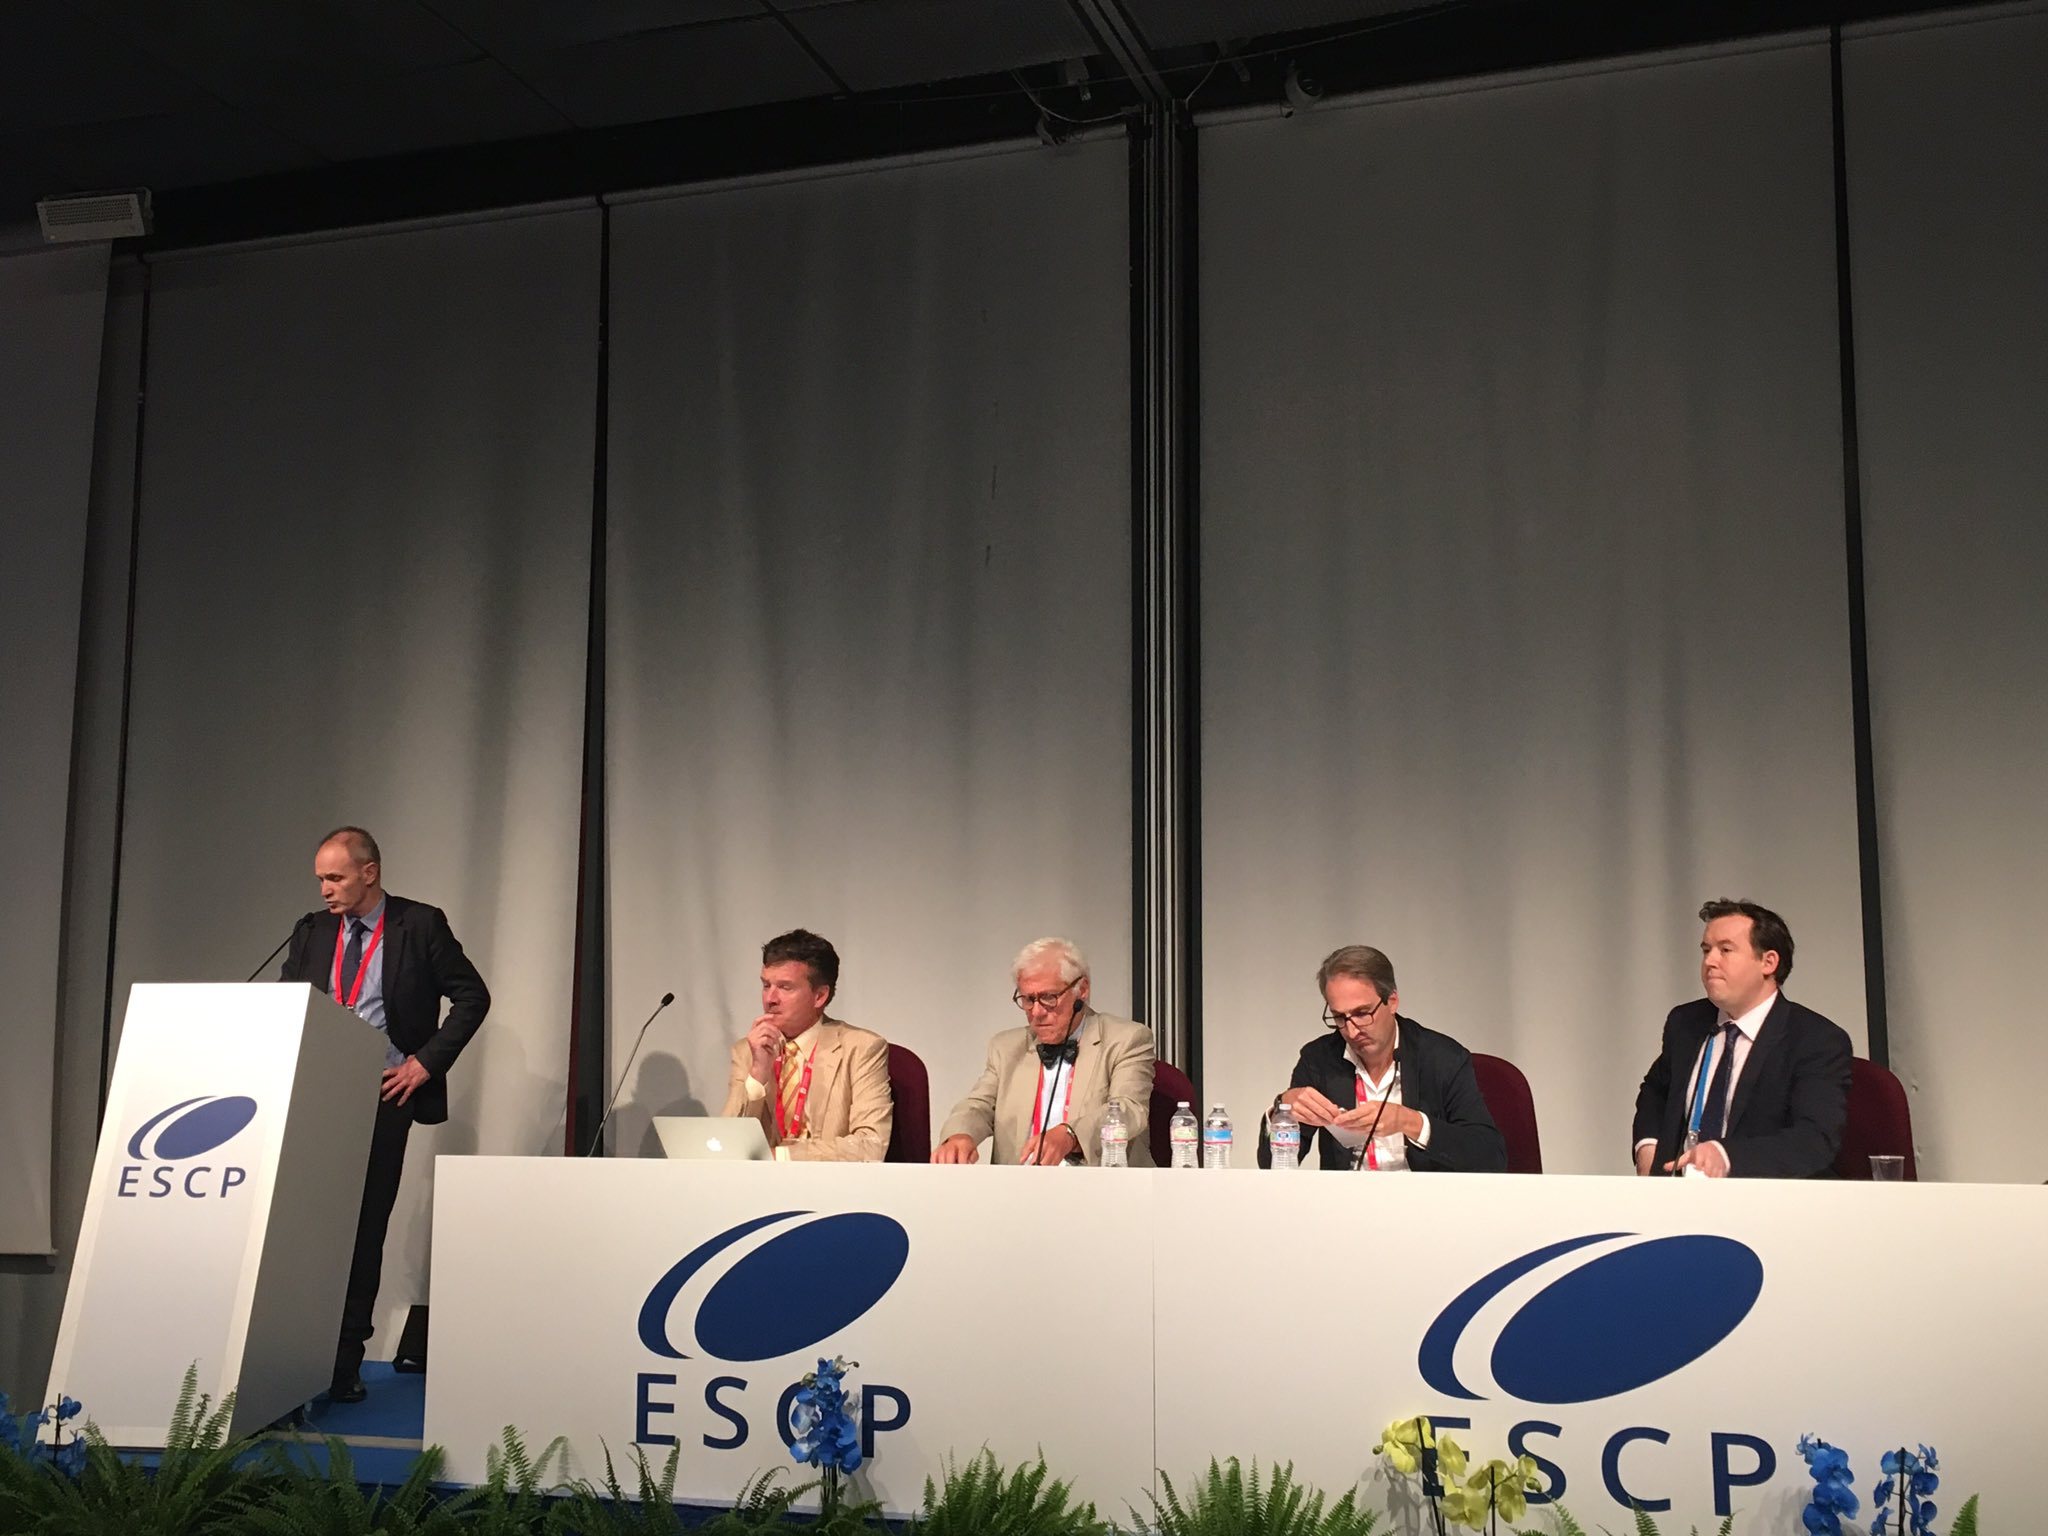 @BiSTC1 @pinkney_t hosts @escp_tweets New Trials Forum #colorectalsurgery #ESCP2016 https://t.co/nSYImVmuld